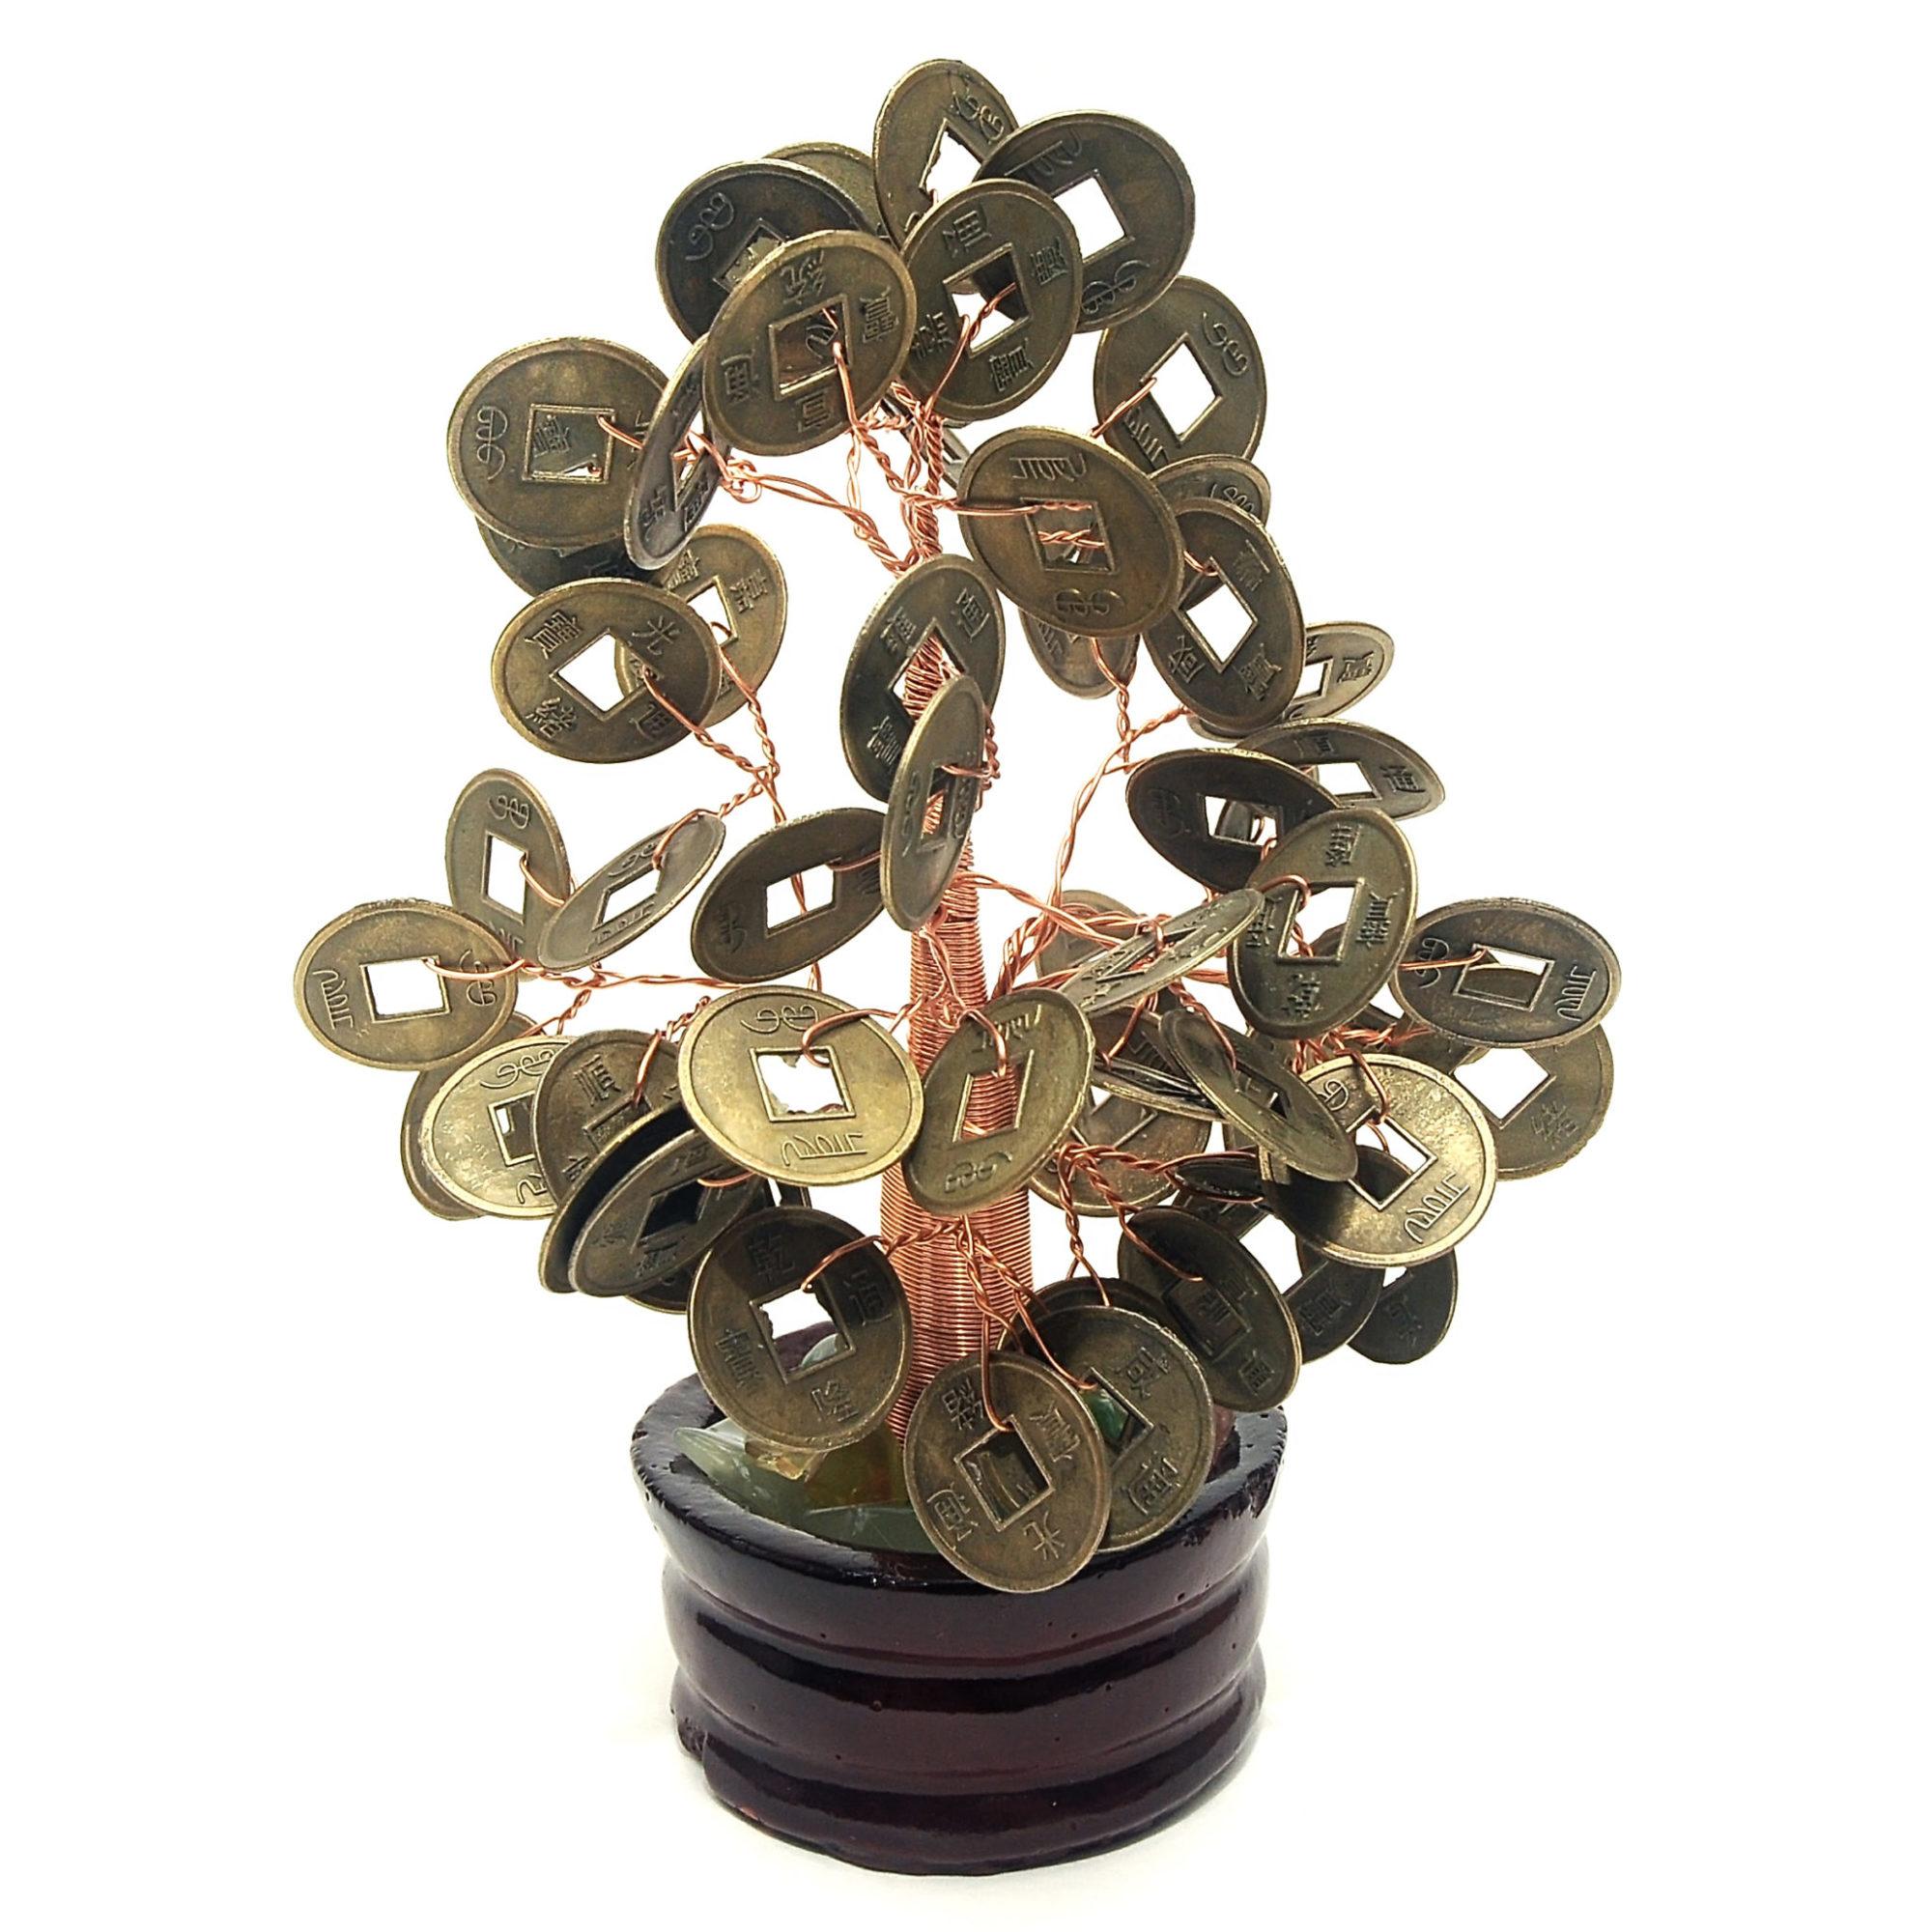 Mah Jongg Counting Coins Money Tree - Great Gift!